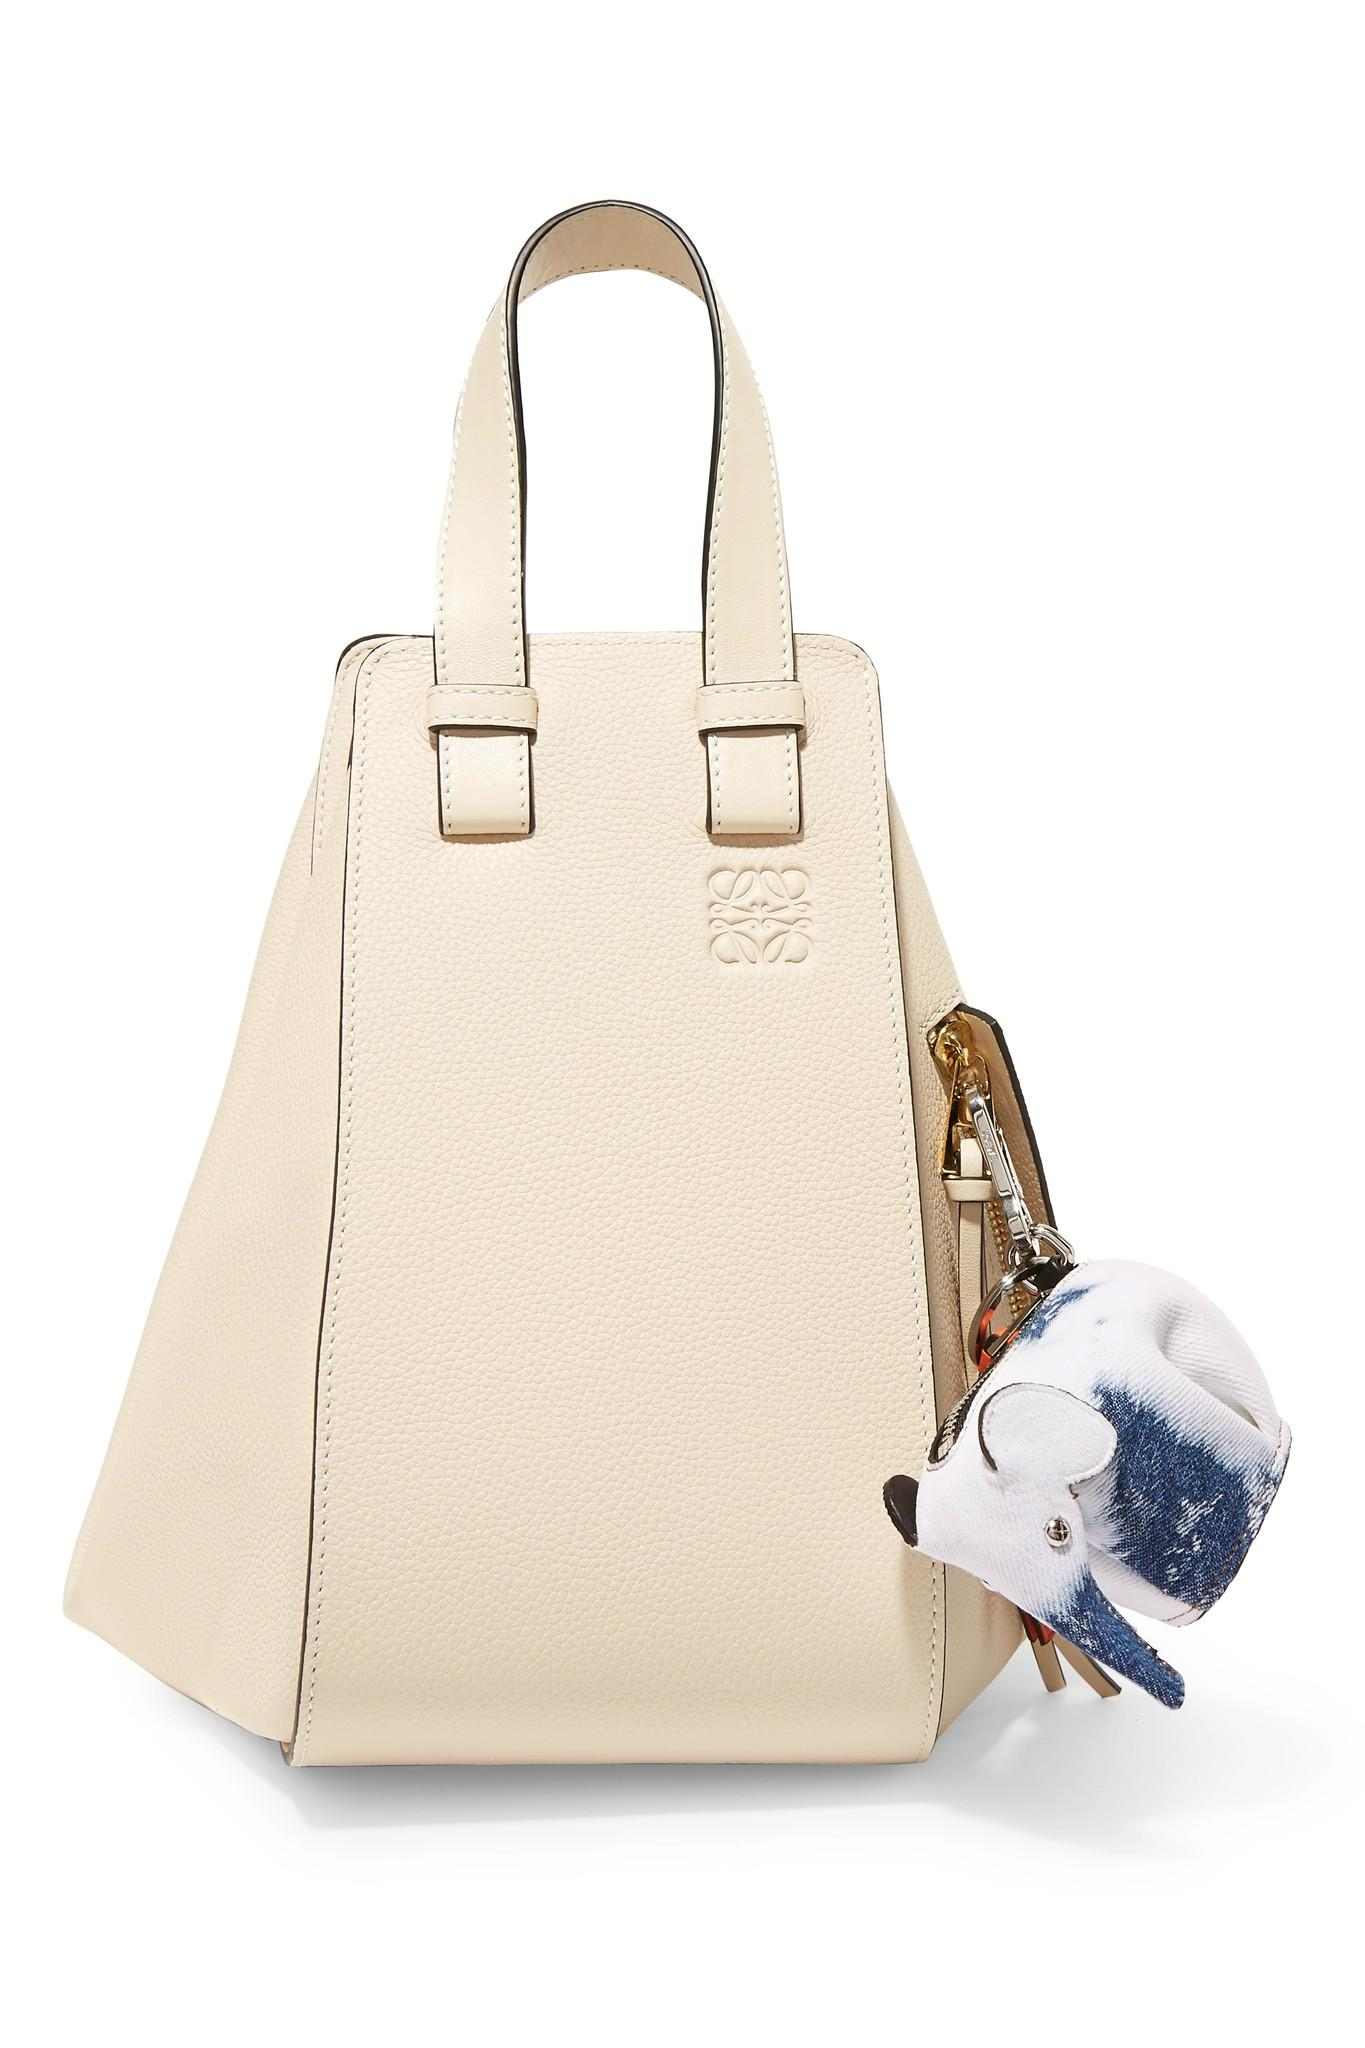 Loewe Elephant Leather-trimmed Denim Bag Charm - Blue tFmbxKN